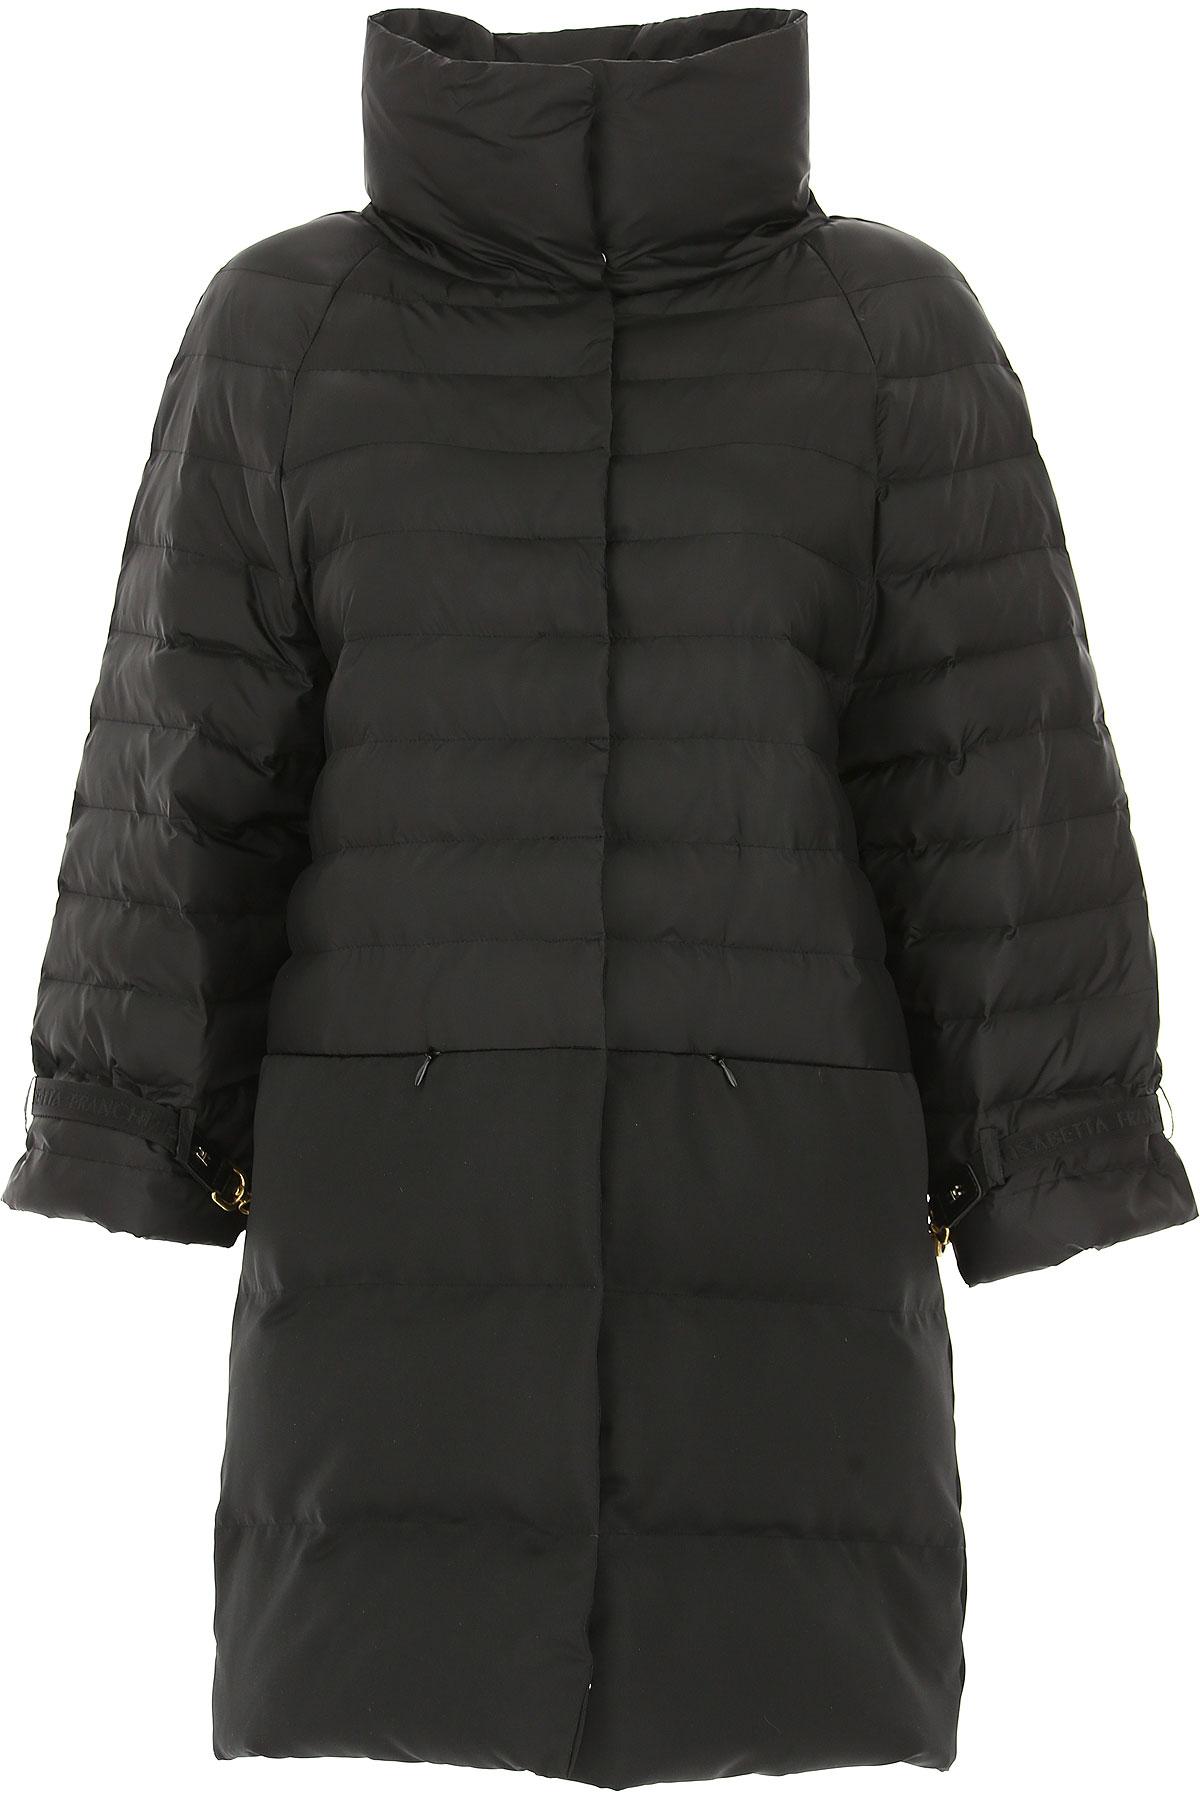 Image of Elisabetta Franchi Down Jacket for Women, Puffer Ski Jacket, Black, polyamide, 2017, 2 4 6 8